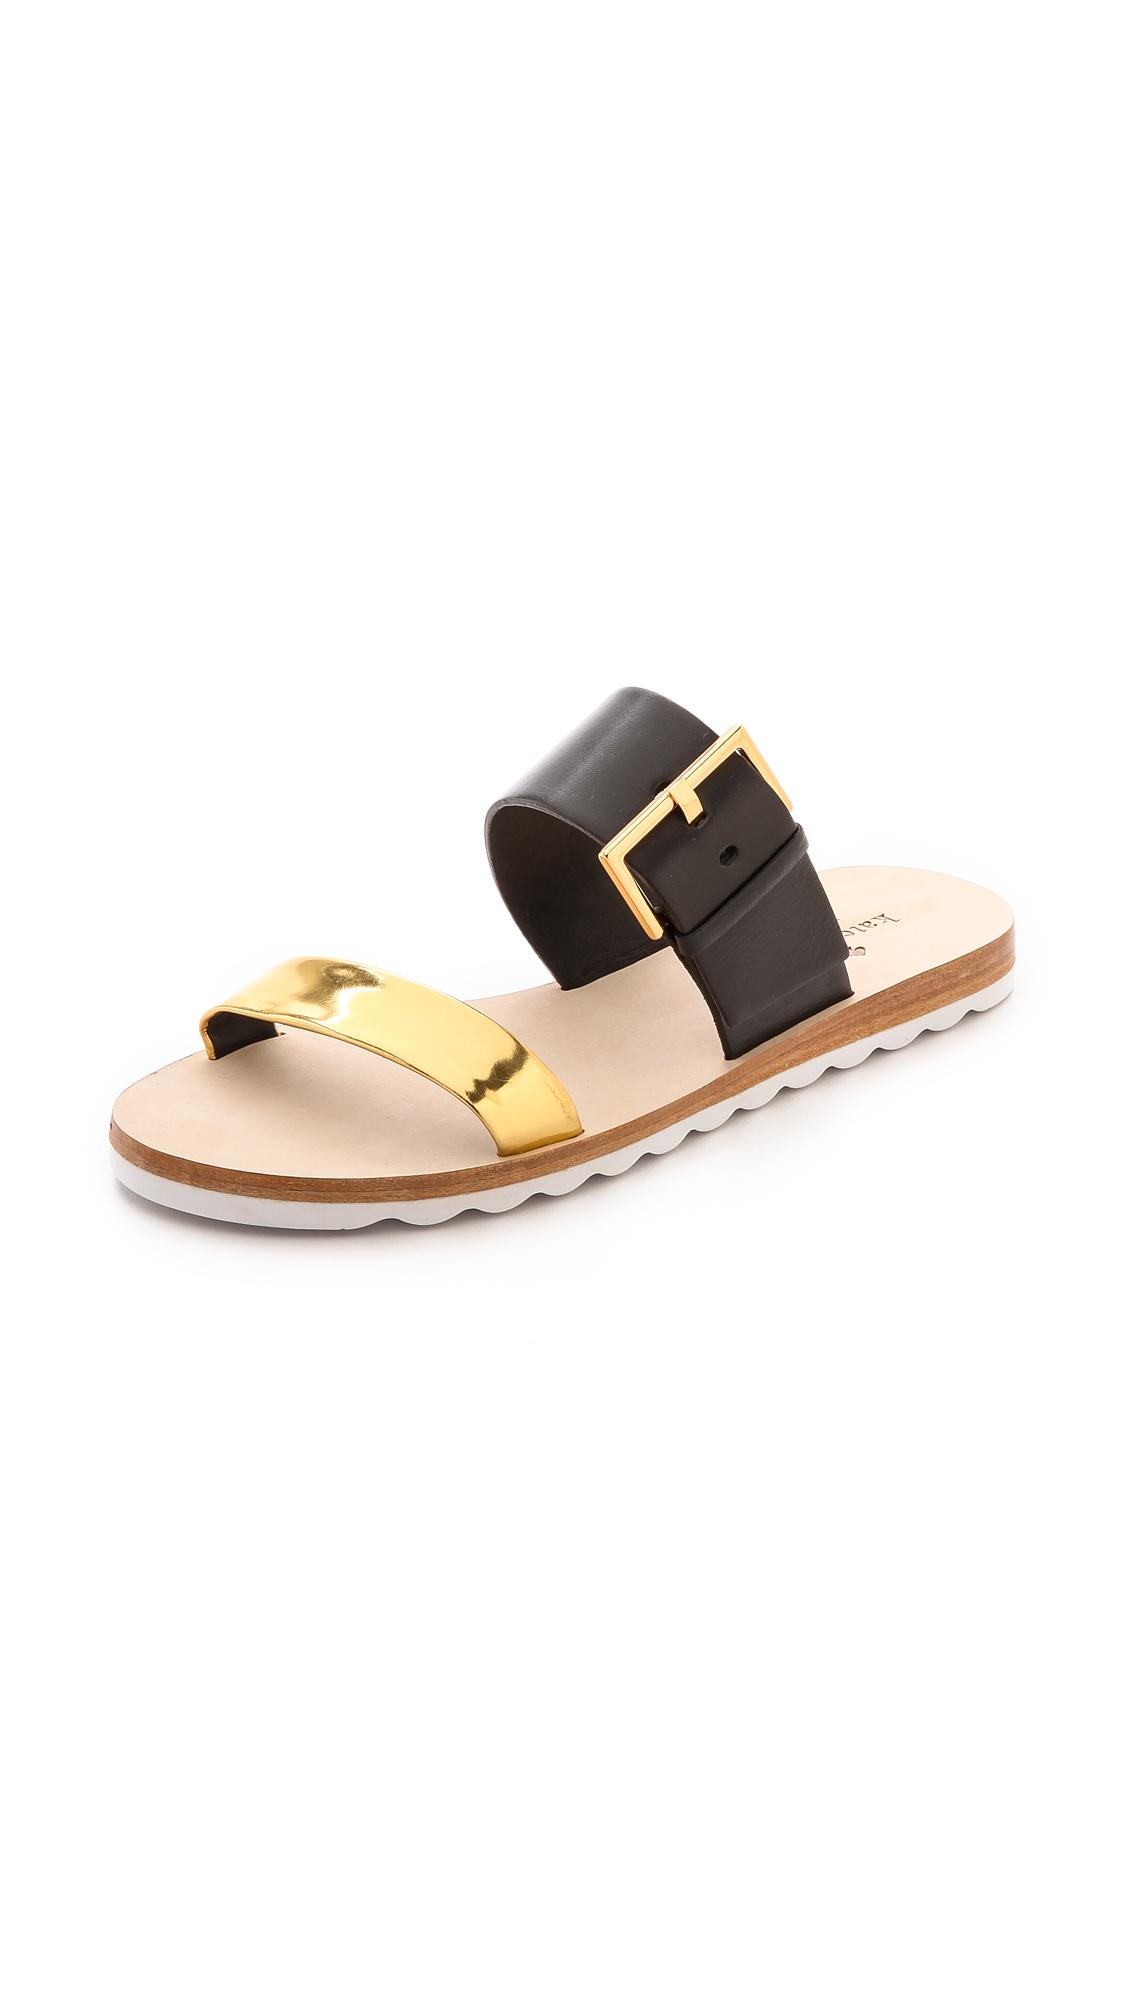 Kate Spade Black Flat Shoes